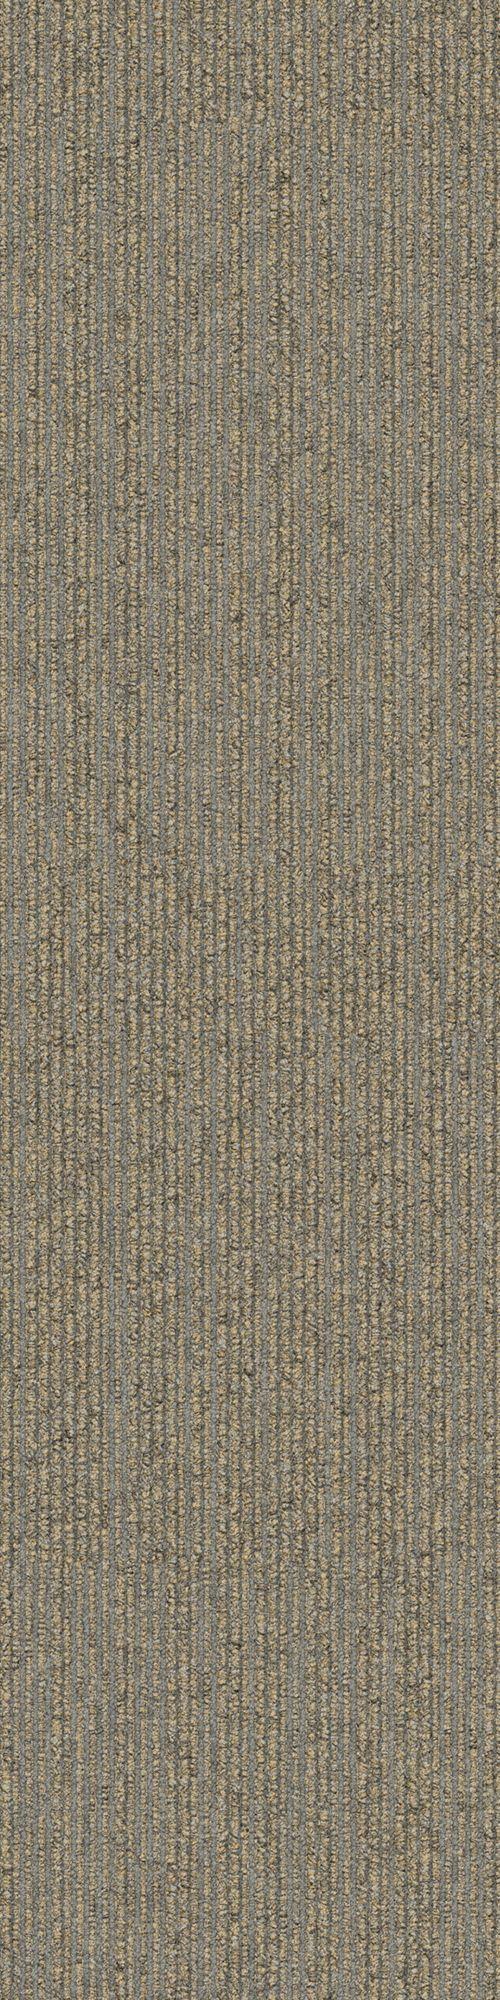 Interface carpet tile: On Line Color name: Pigeon